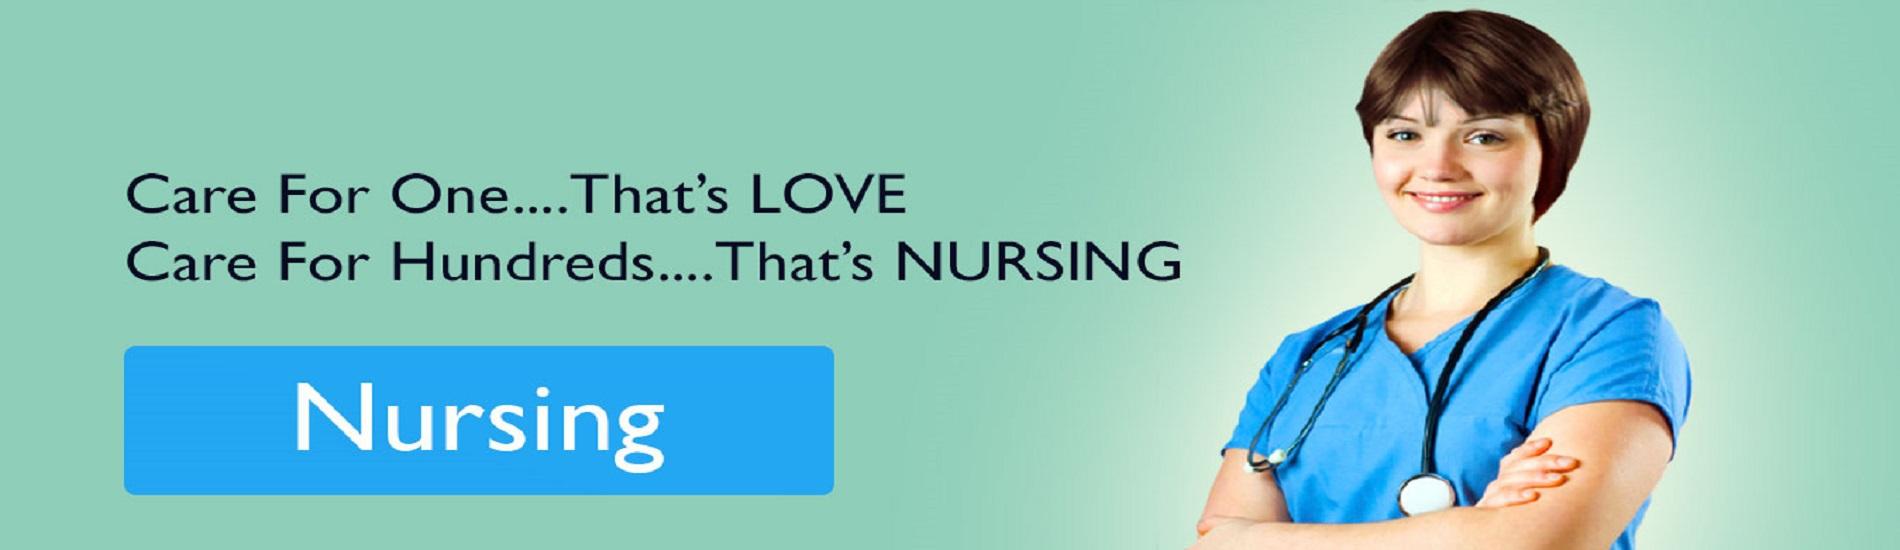 how-to-get-direct-management-quota-admission-top-nursing-college-bangalore